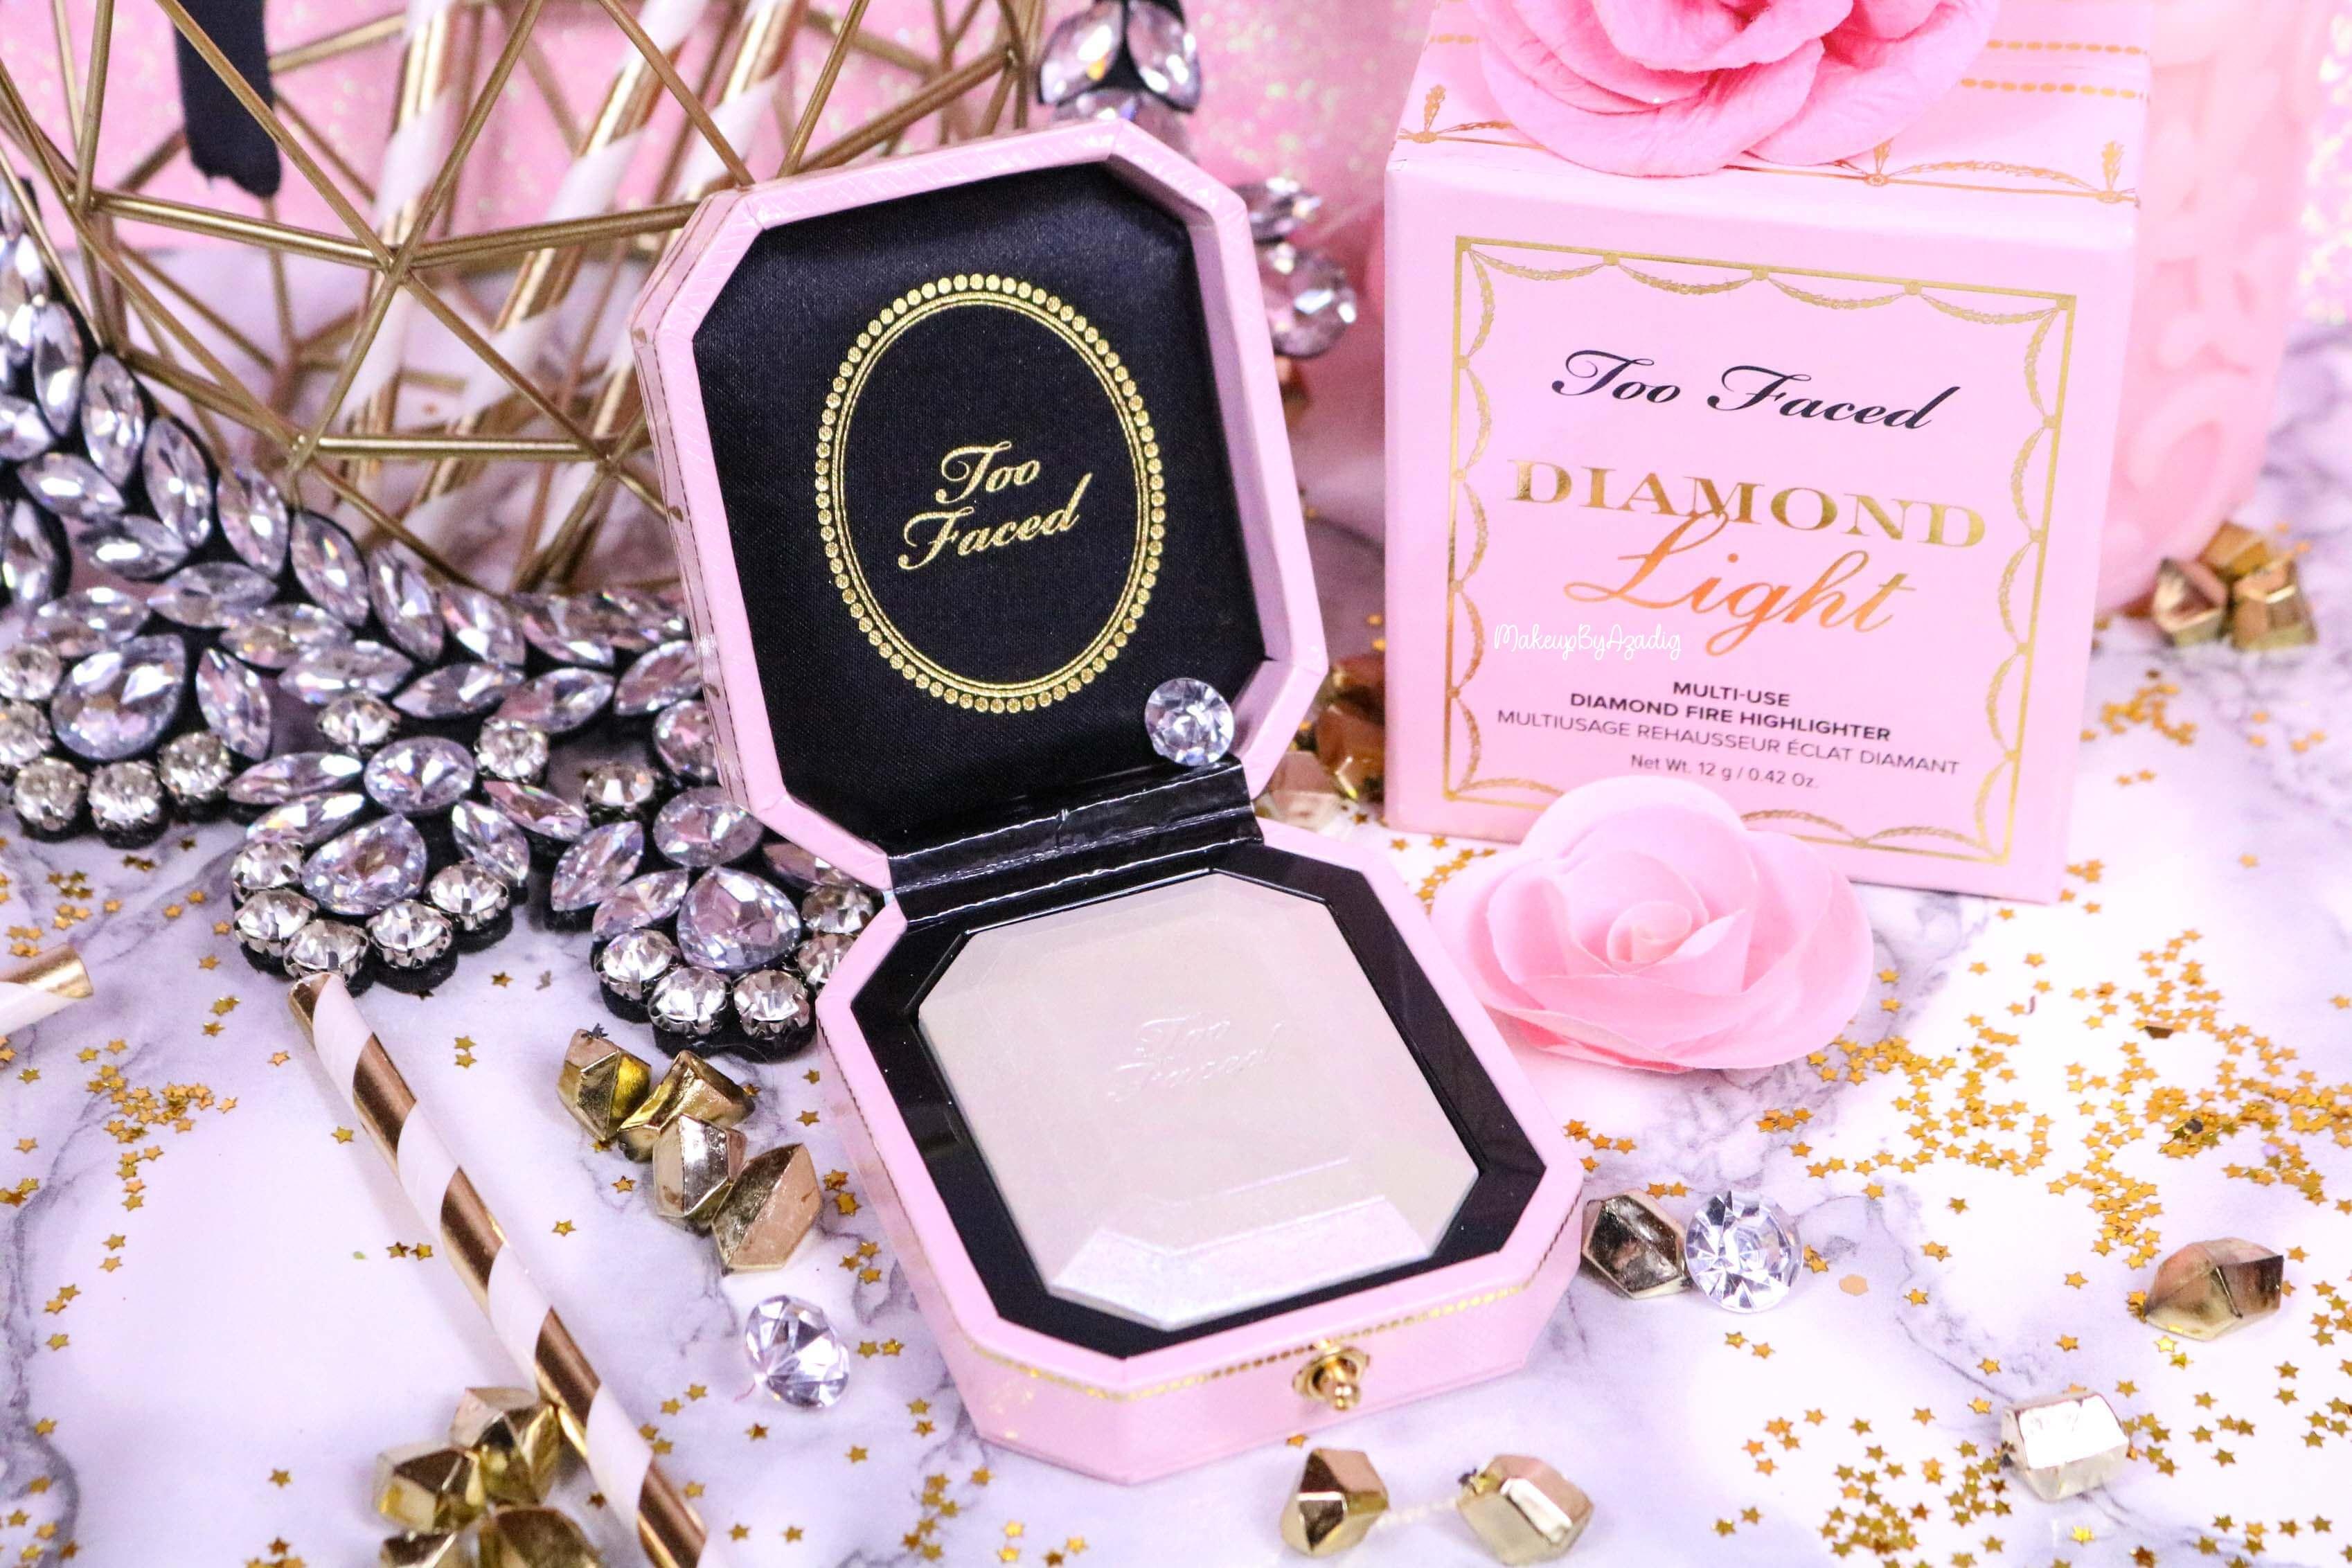 revue-highlighter-diamond-light-toofaced-enlumineur-diamant-collection-makeup-makeupbyazadig-sortie-france-influencer-swatch-avis-prix-miniature